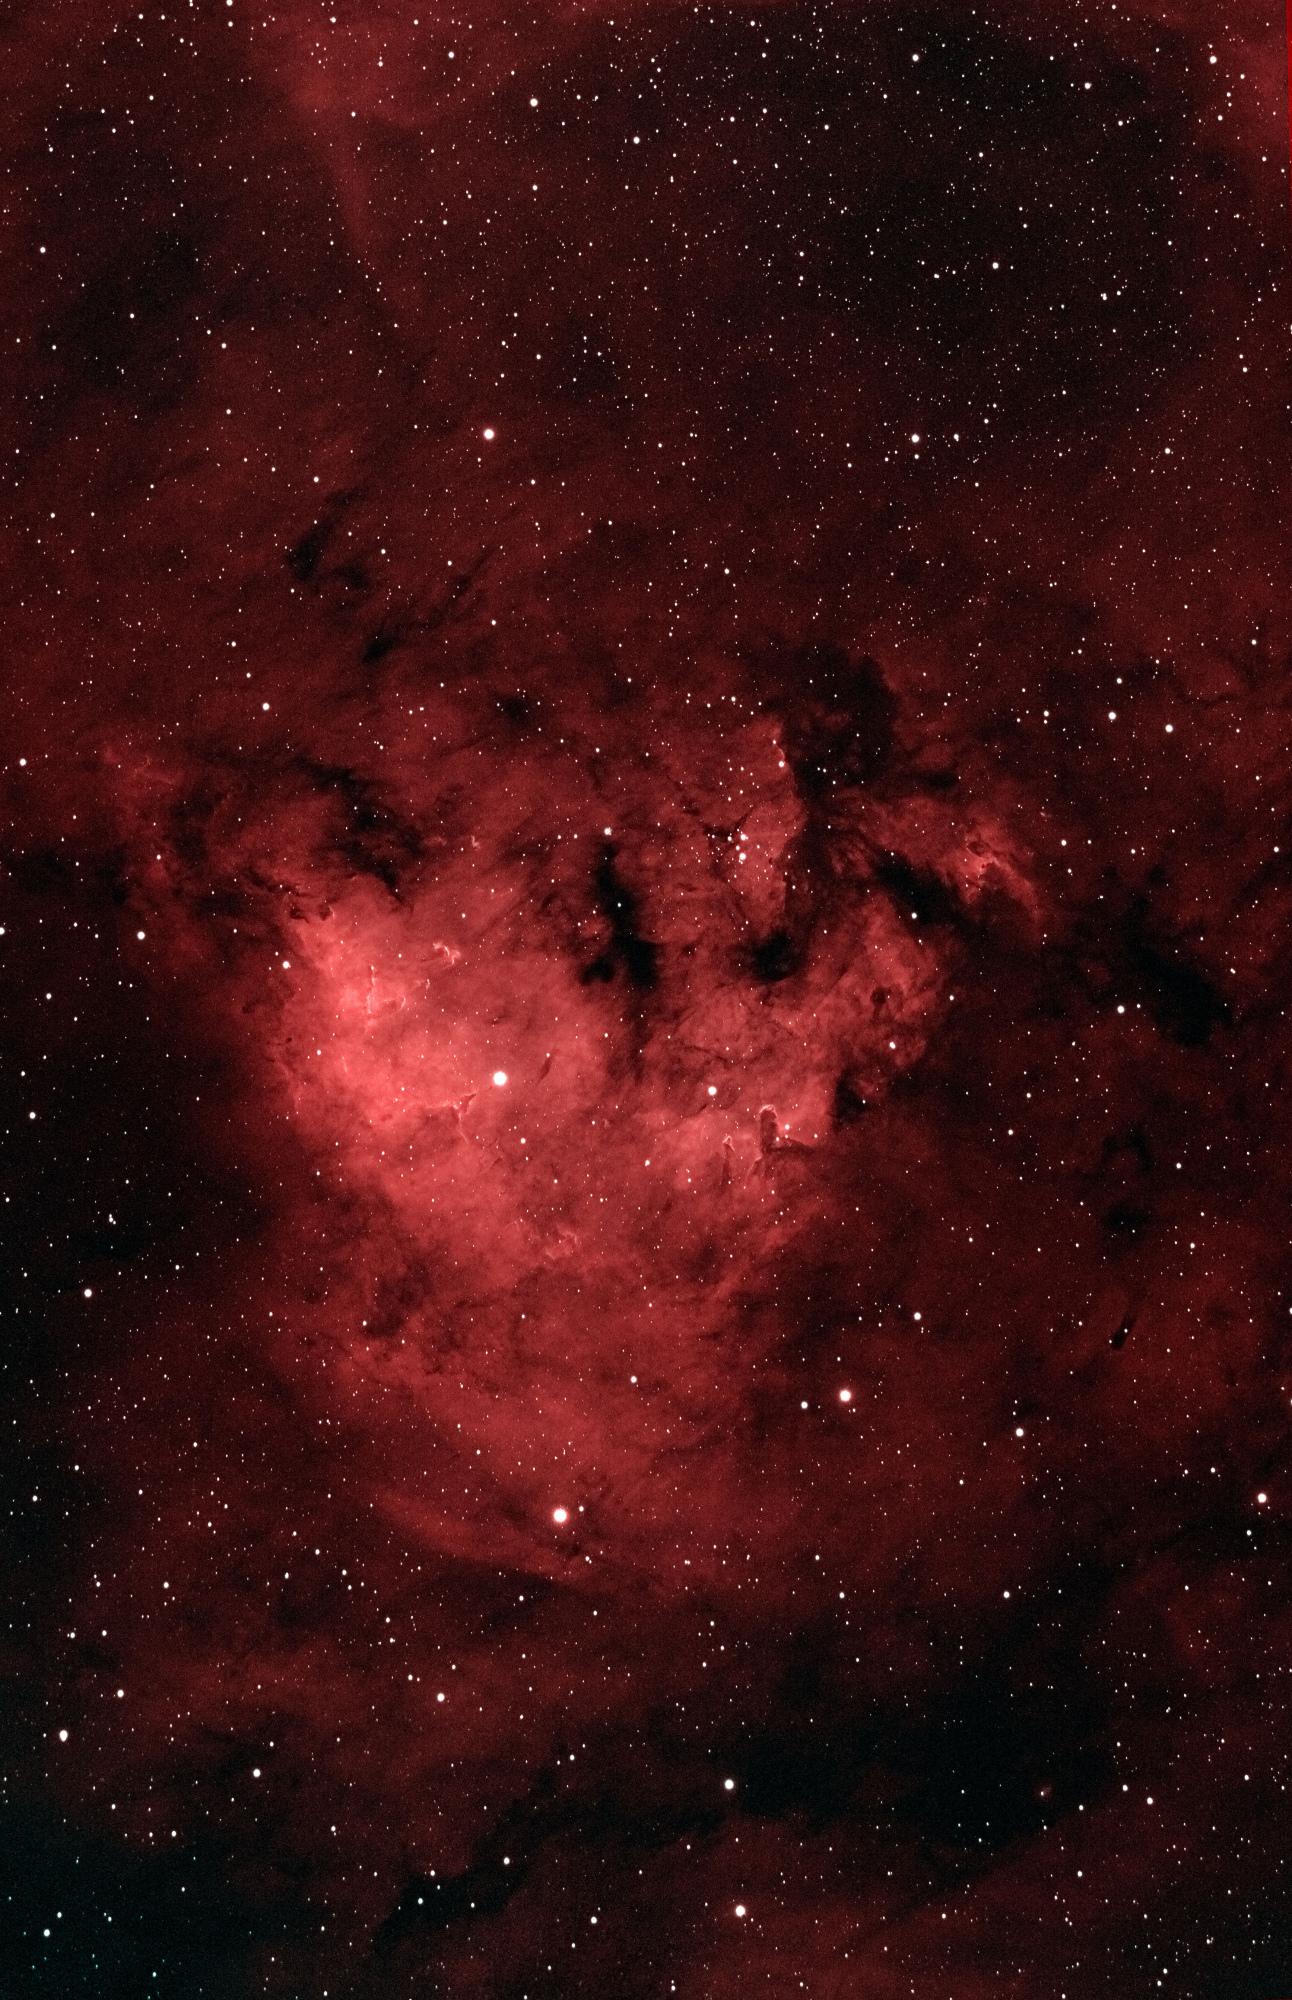 NGC7822_HOO_PS.thumb.jpg.40e4ee578b54f1dcd2e045e1172e3977.jpg